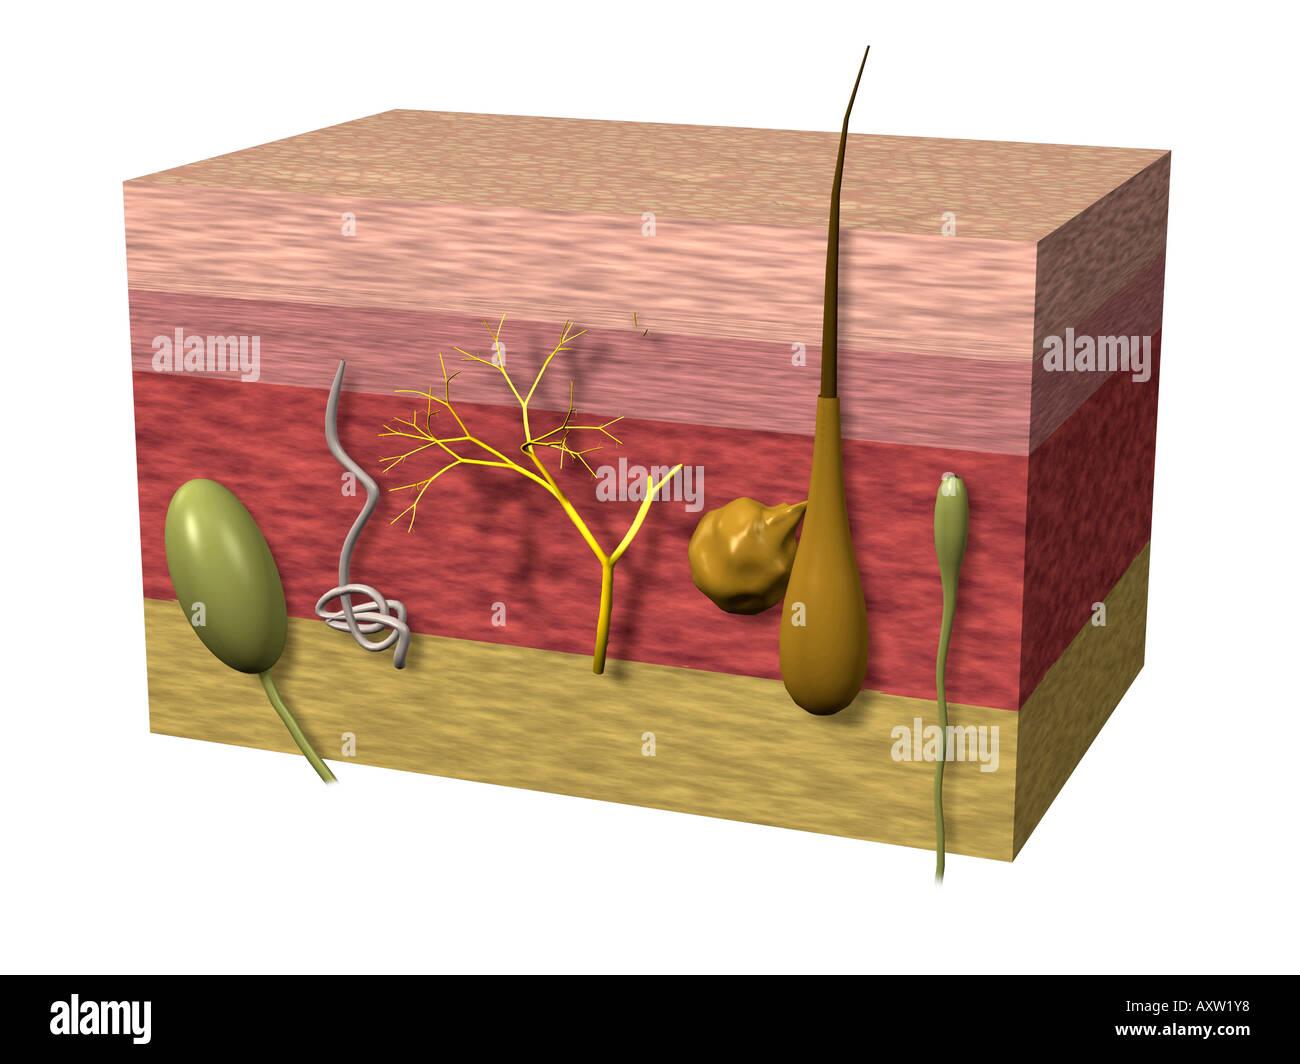 Menschliche Epidermis Stockfoto, Bild: 9668215 - Alamy